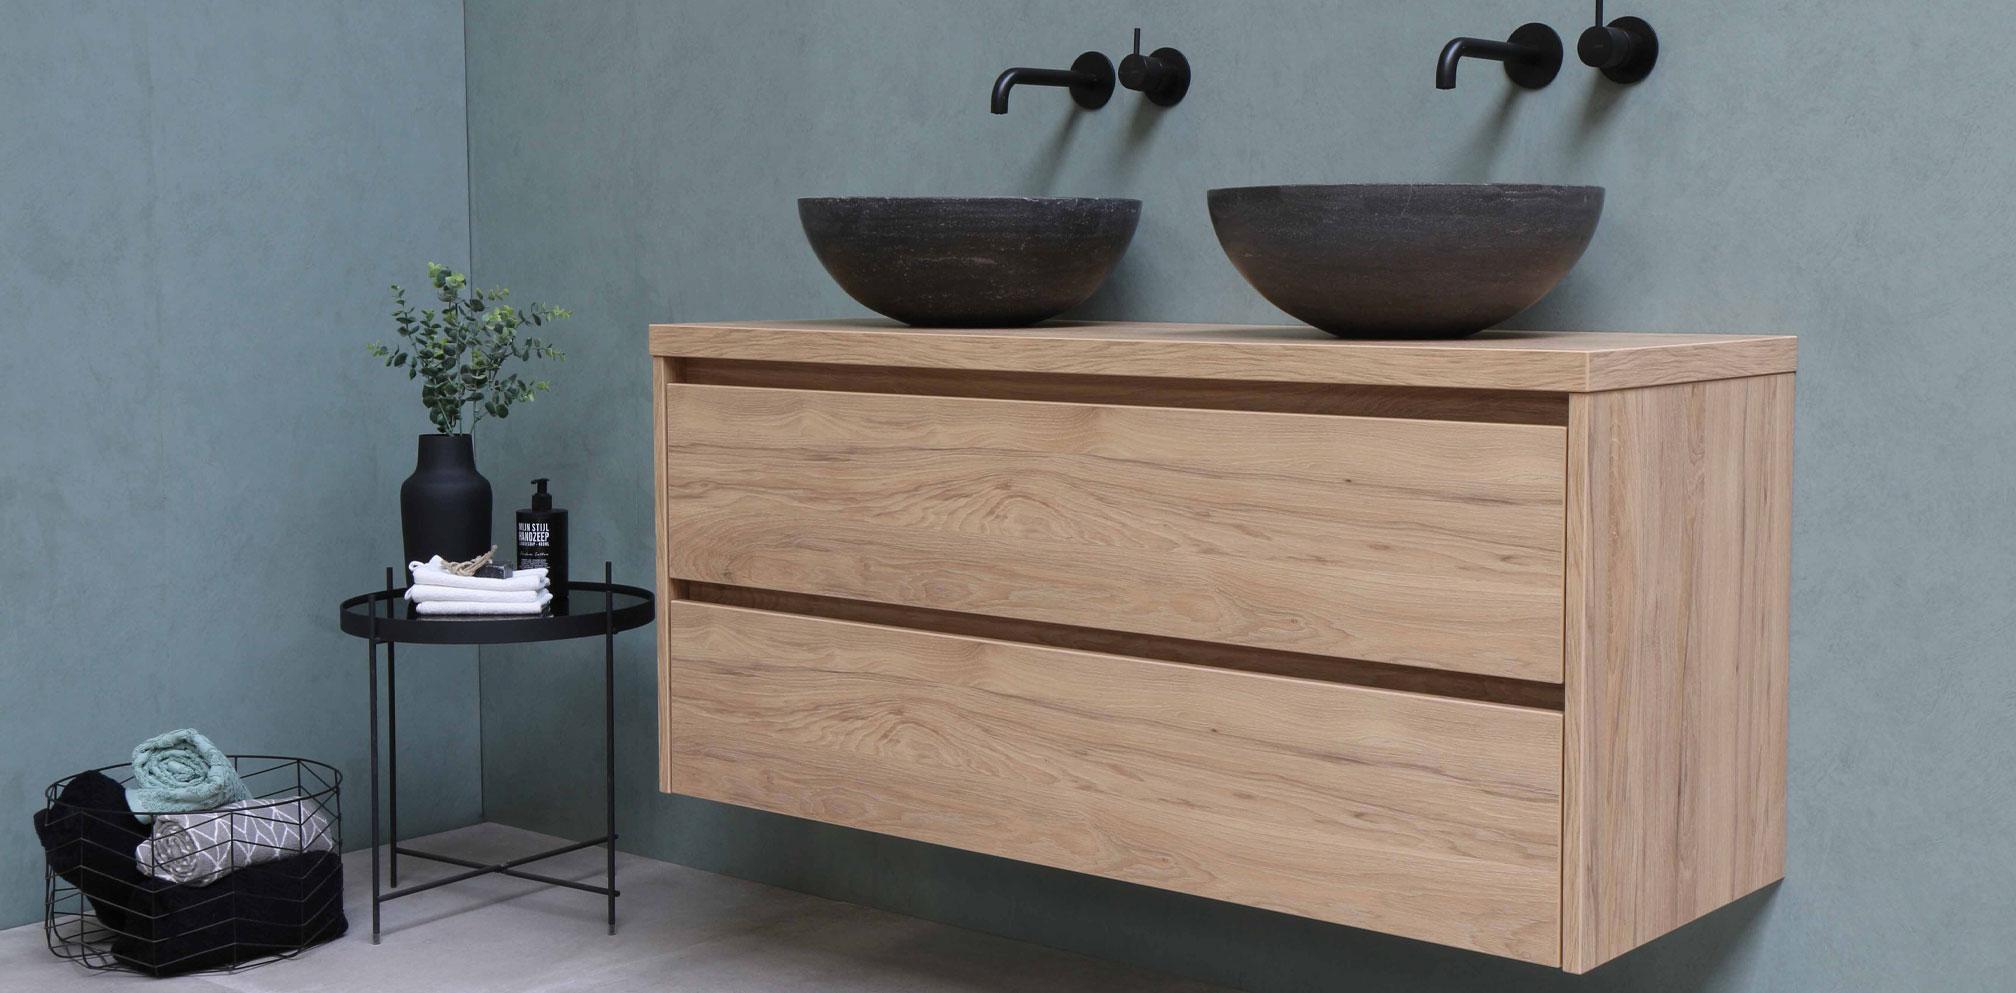 Bathroom Design - 10 Ways To Modernize | furnitur